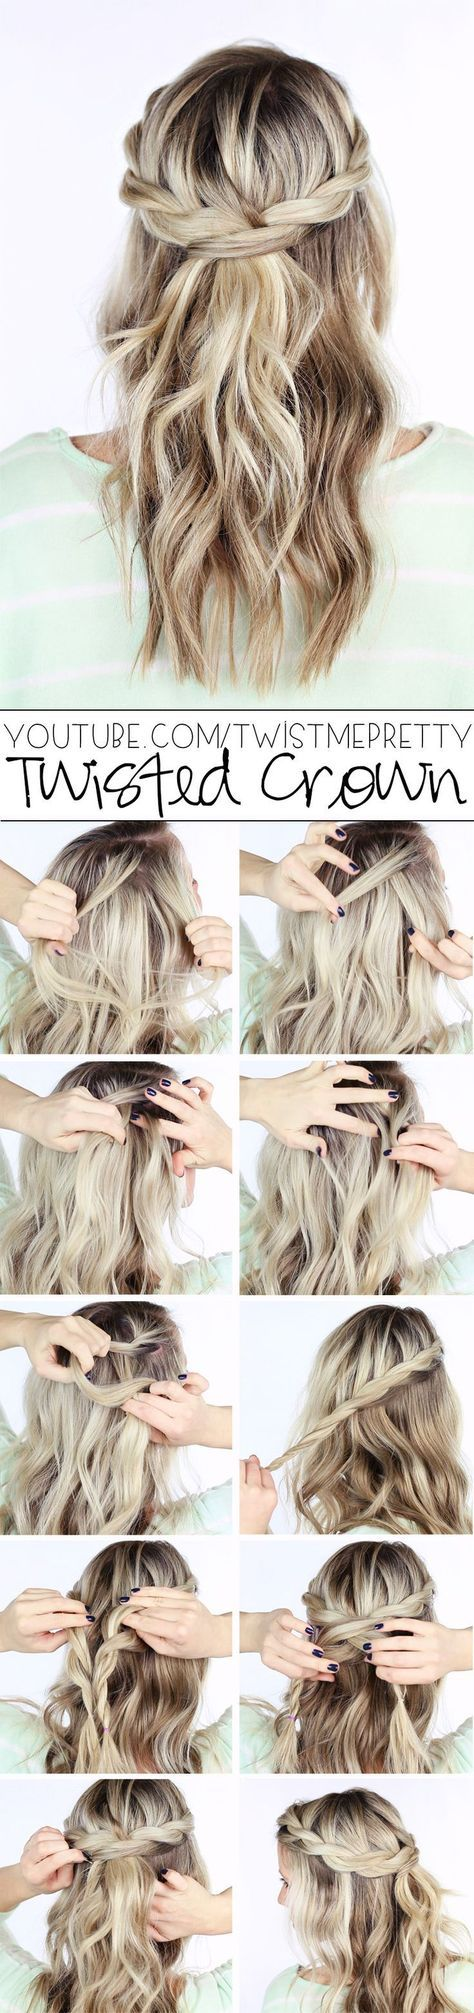 Twisted crown braid half up half down hairstyle by twistmepretty